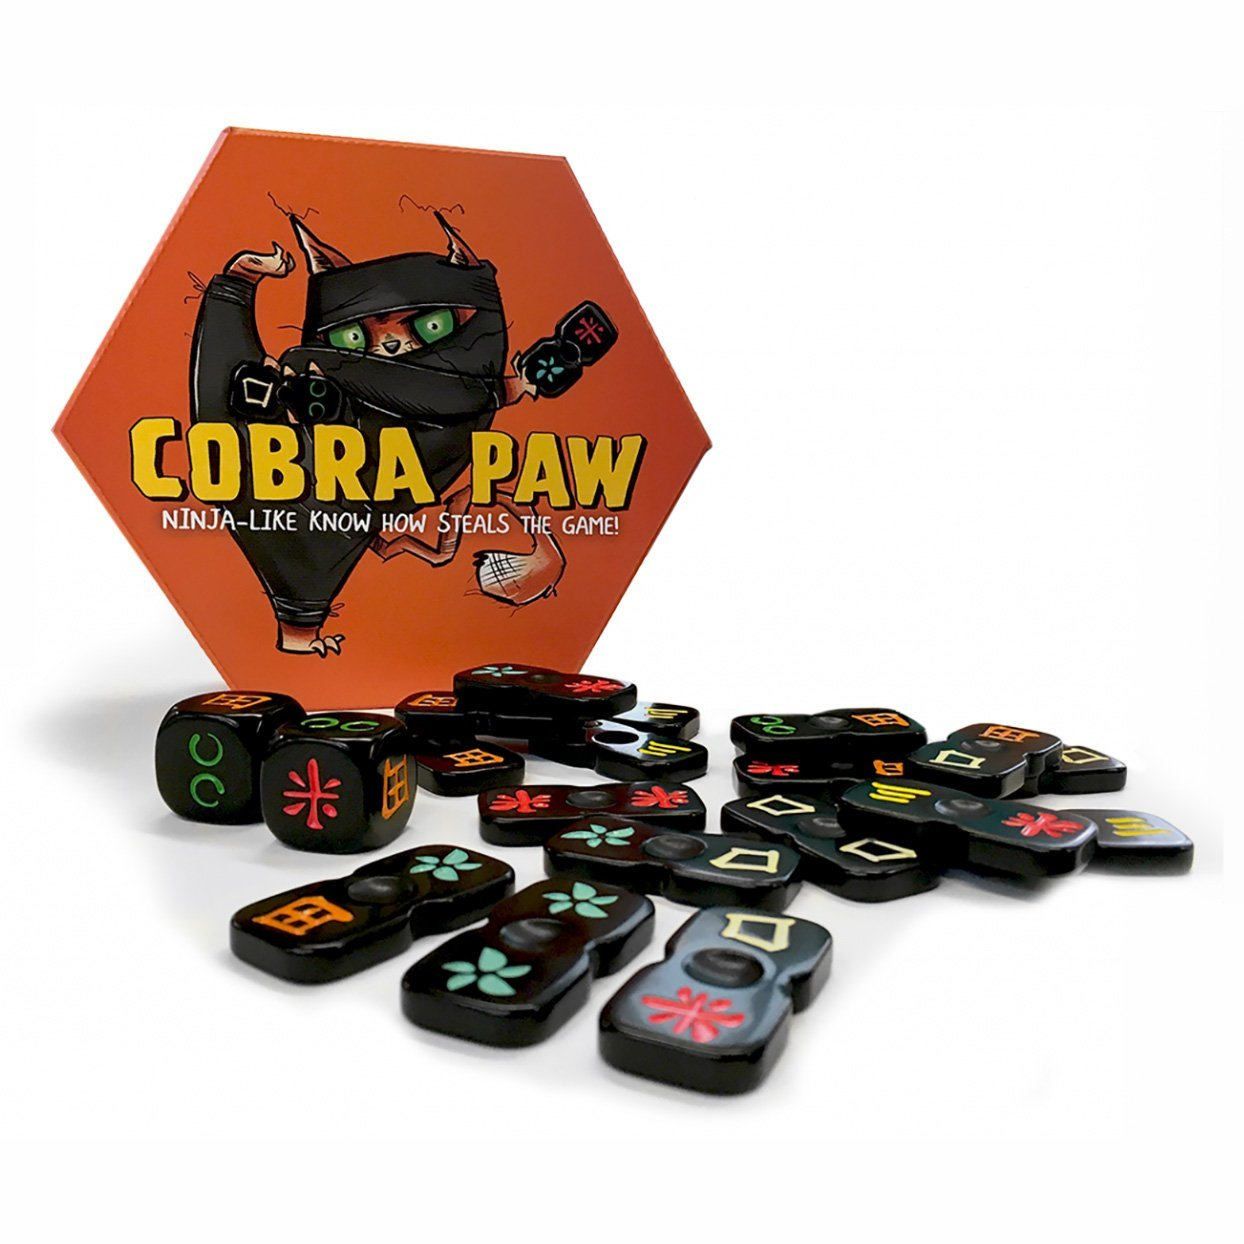 BANANAGRAMS Cobra Paw Juego